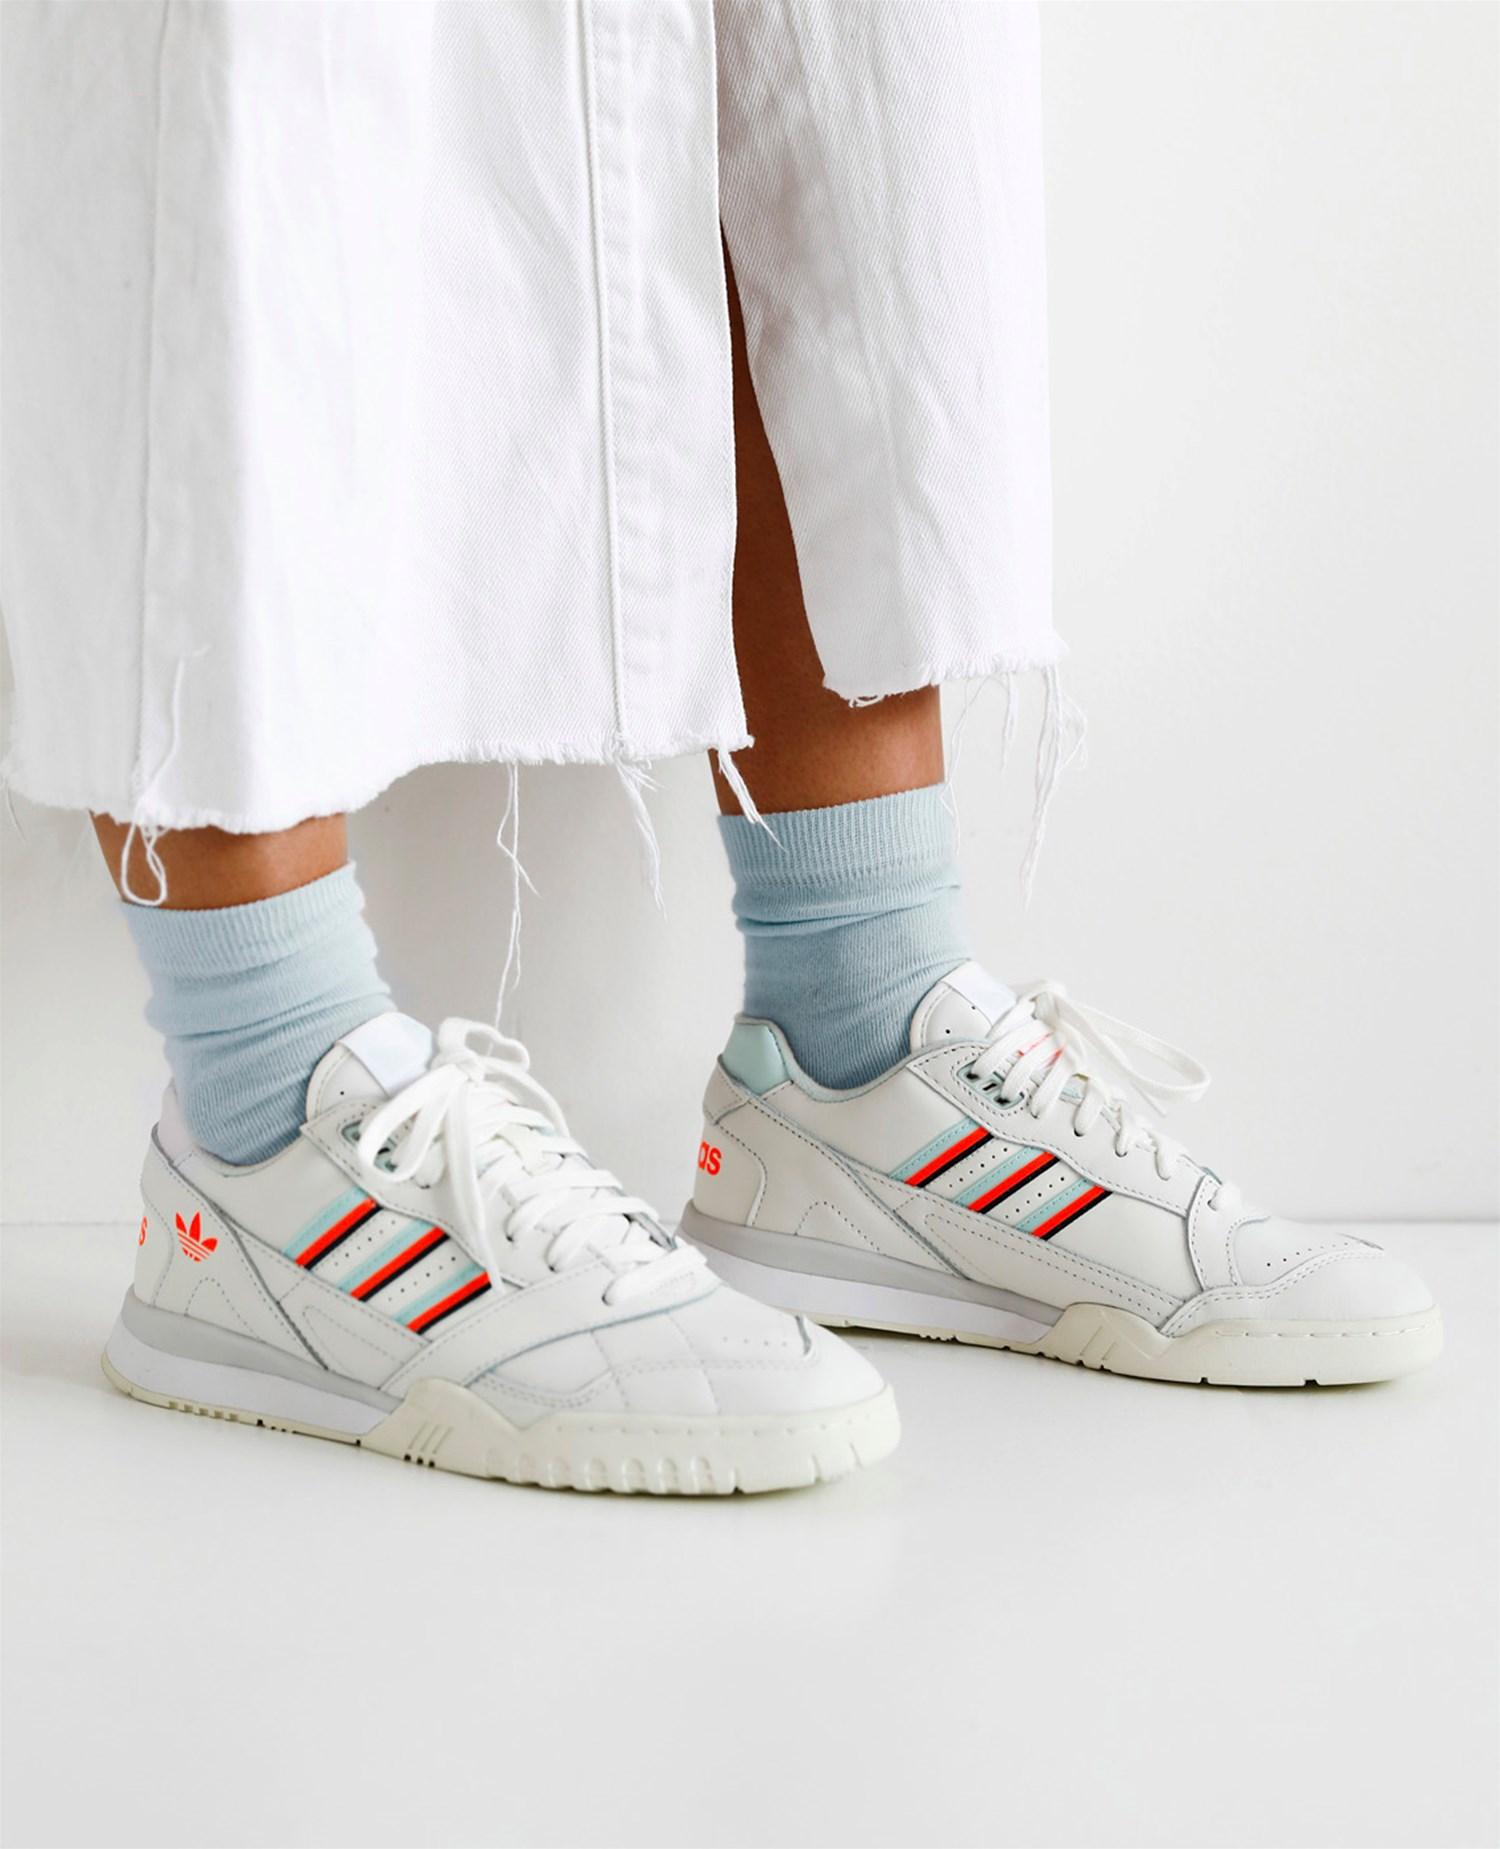 e612b77e6e3216 Naked - Supplying girls with sneakers